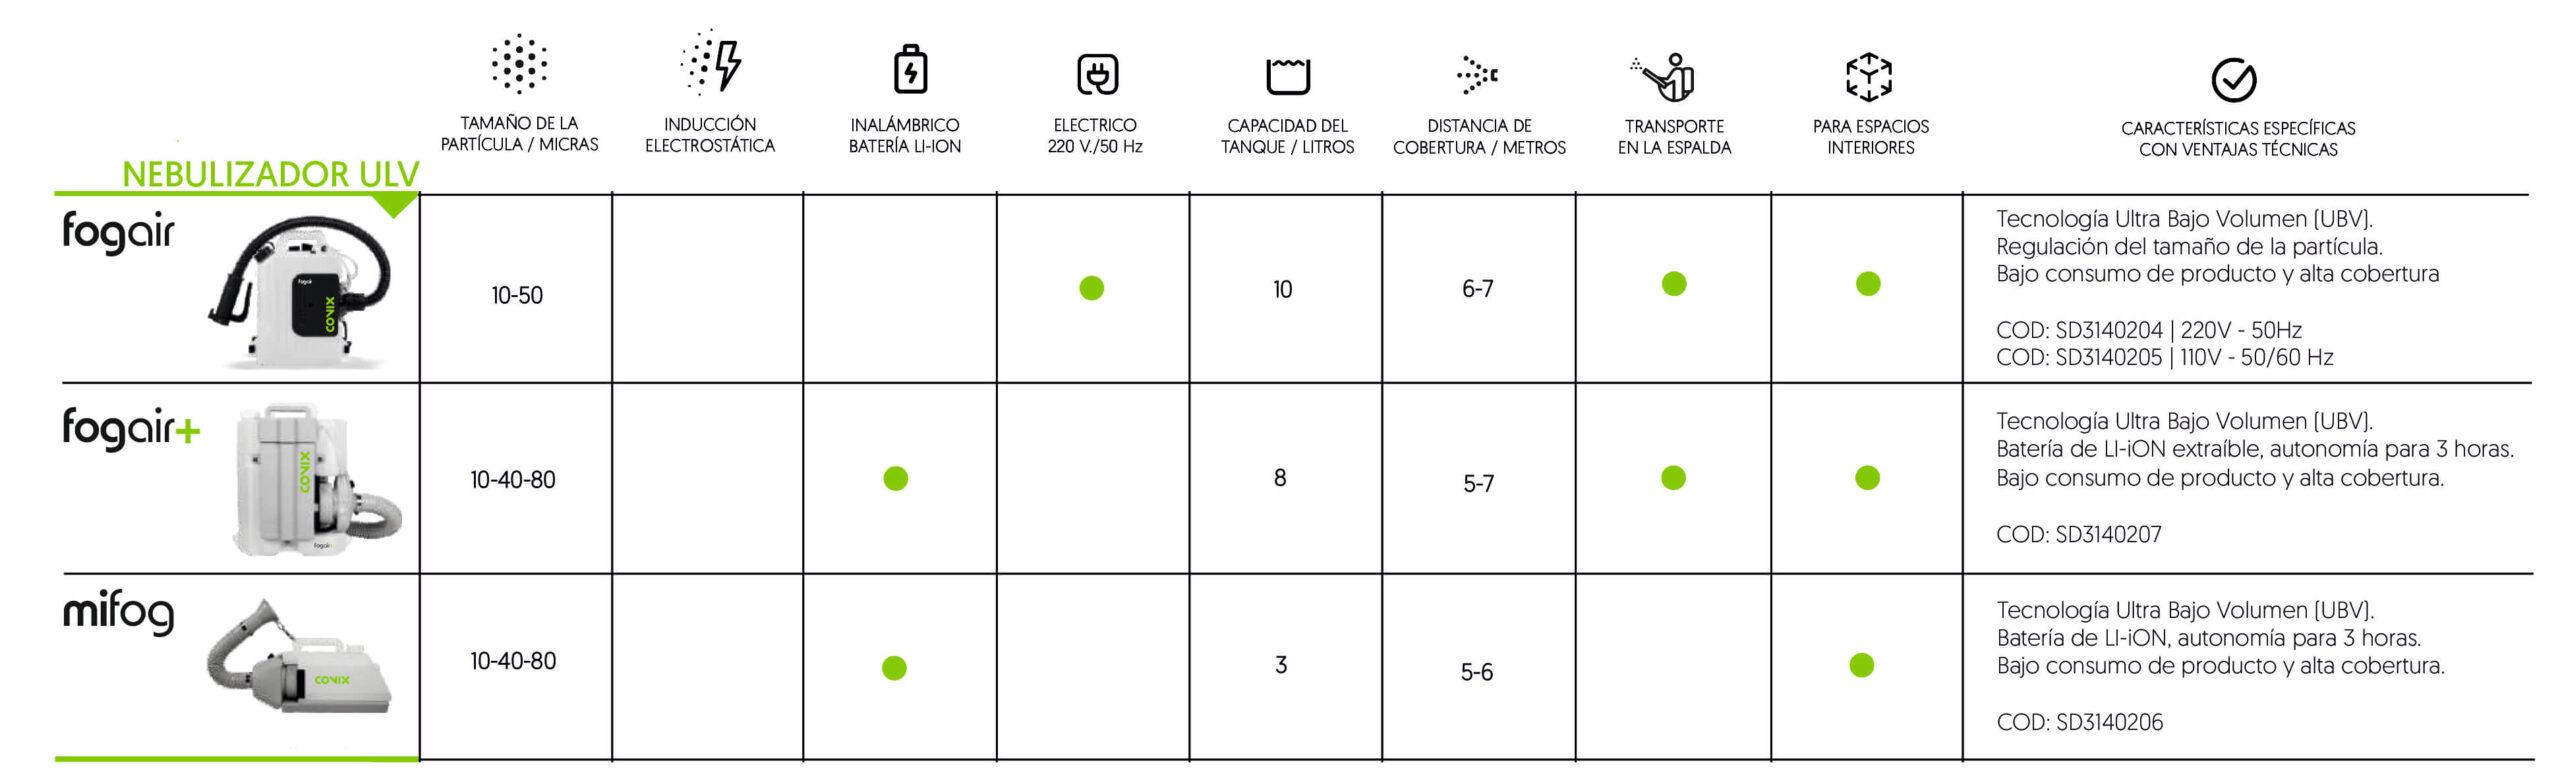 comparativa de nebulizadors uilv para desinfección